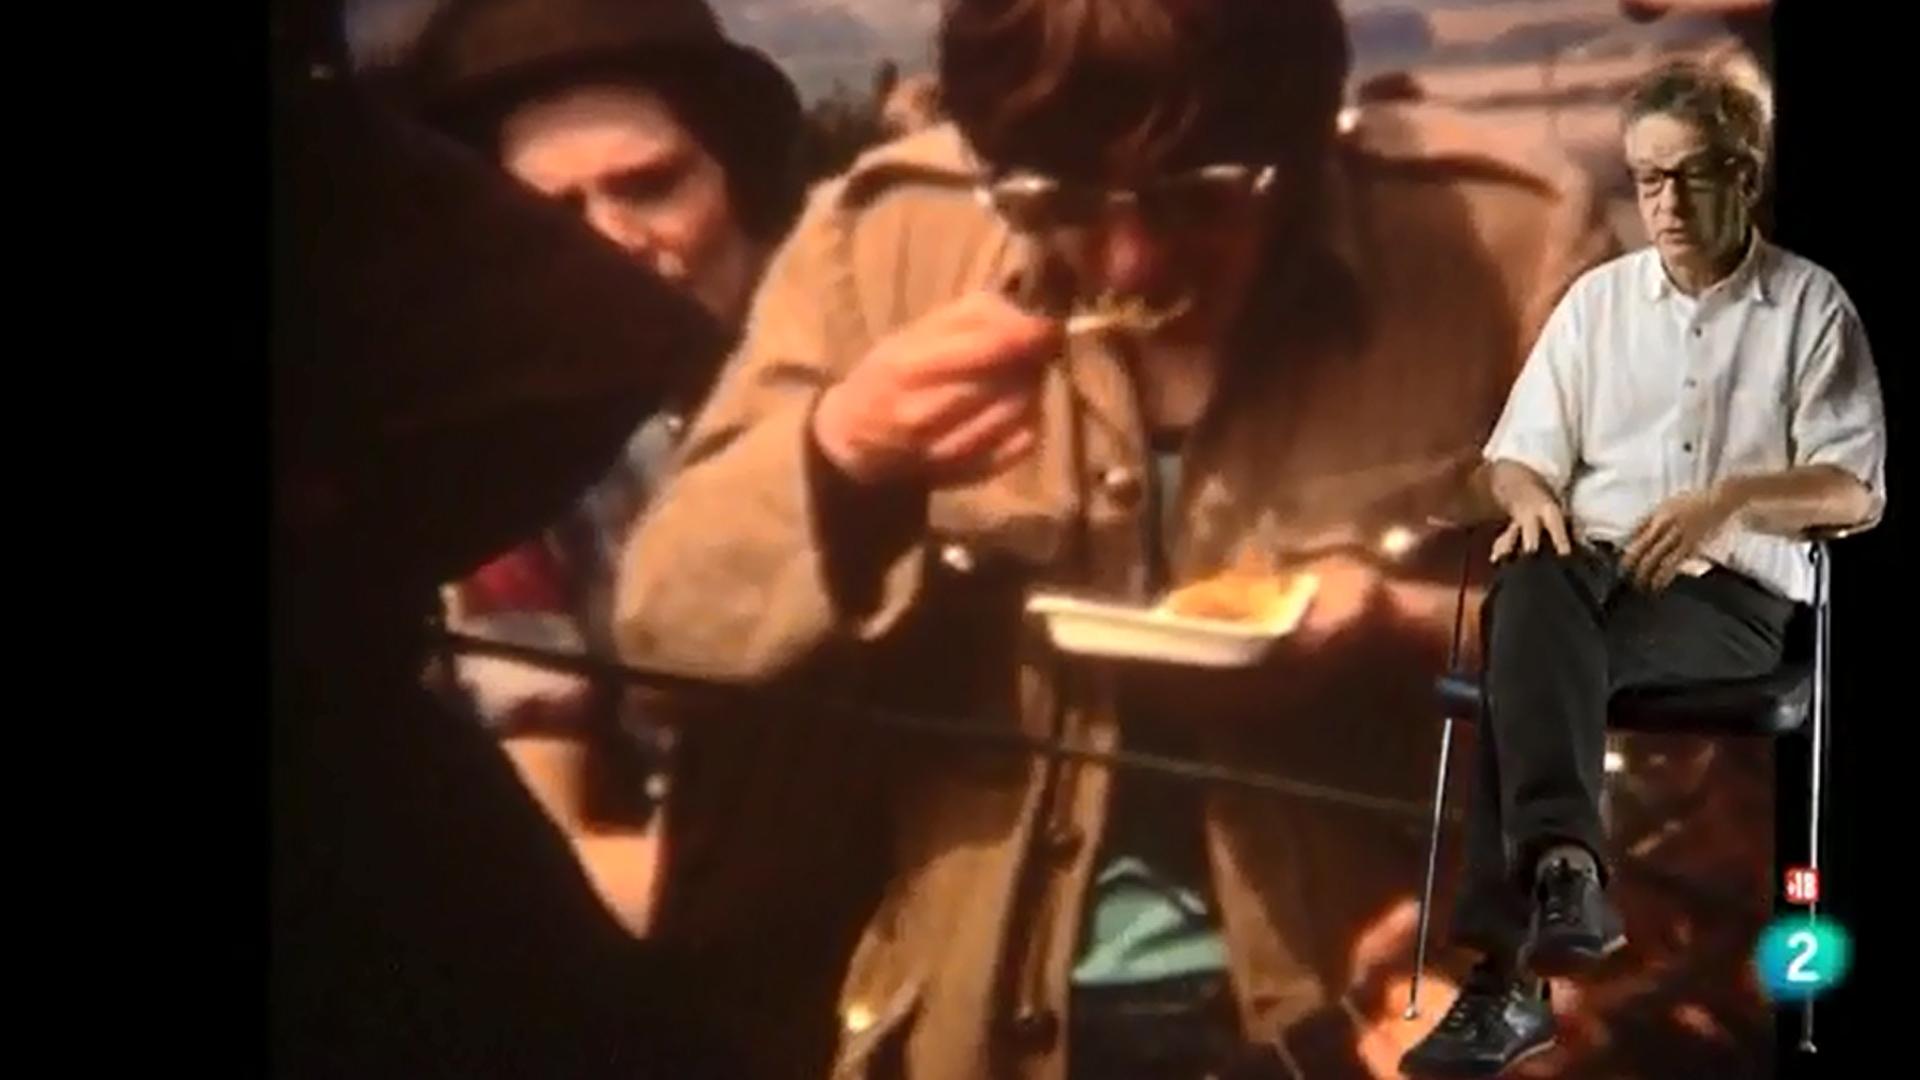 Especial TVE Catalunya - Barcelona era una festa. (Underground 1970-1980)